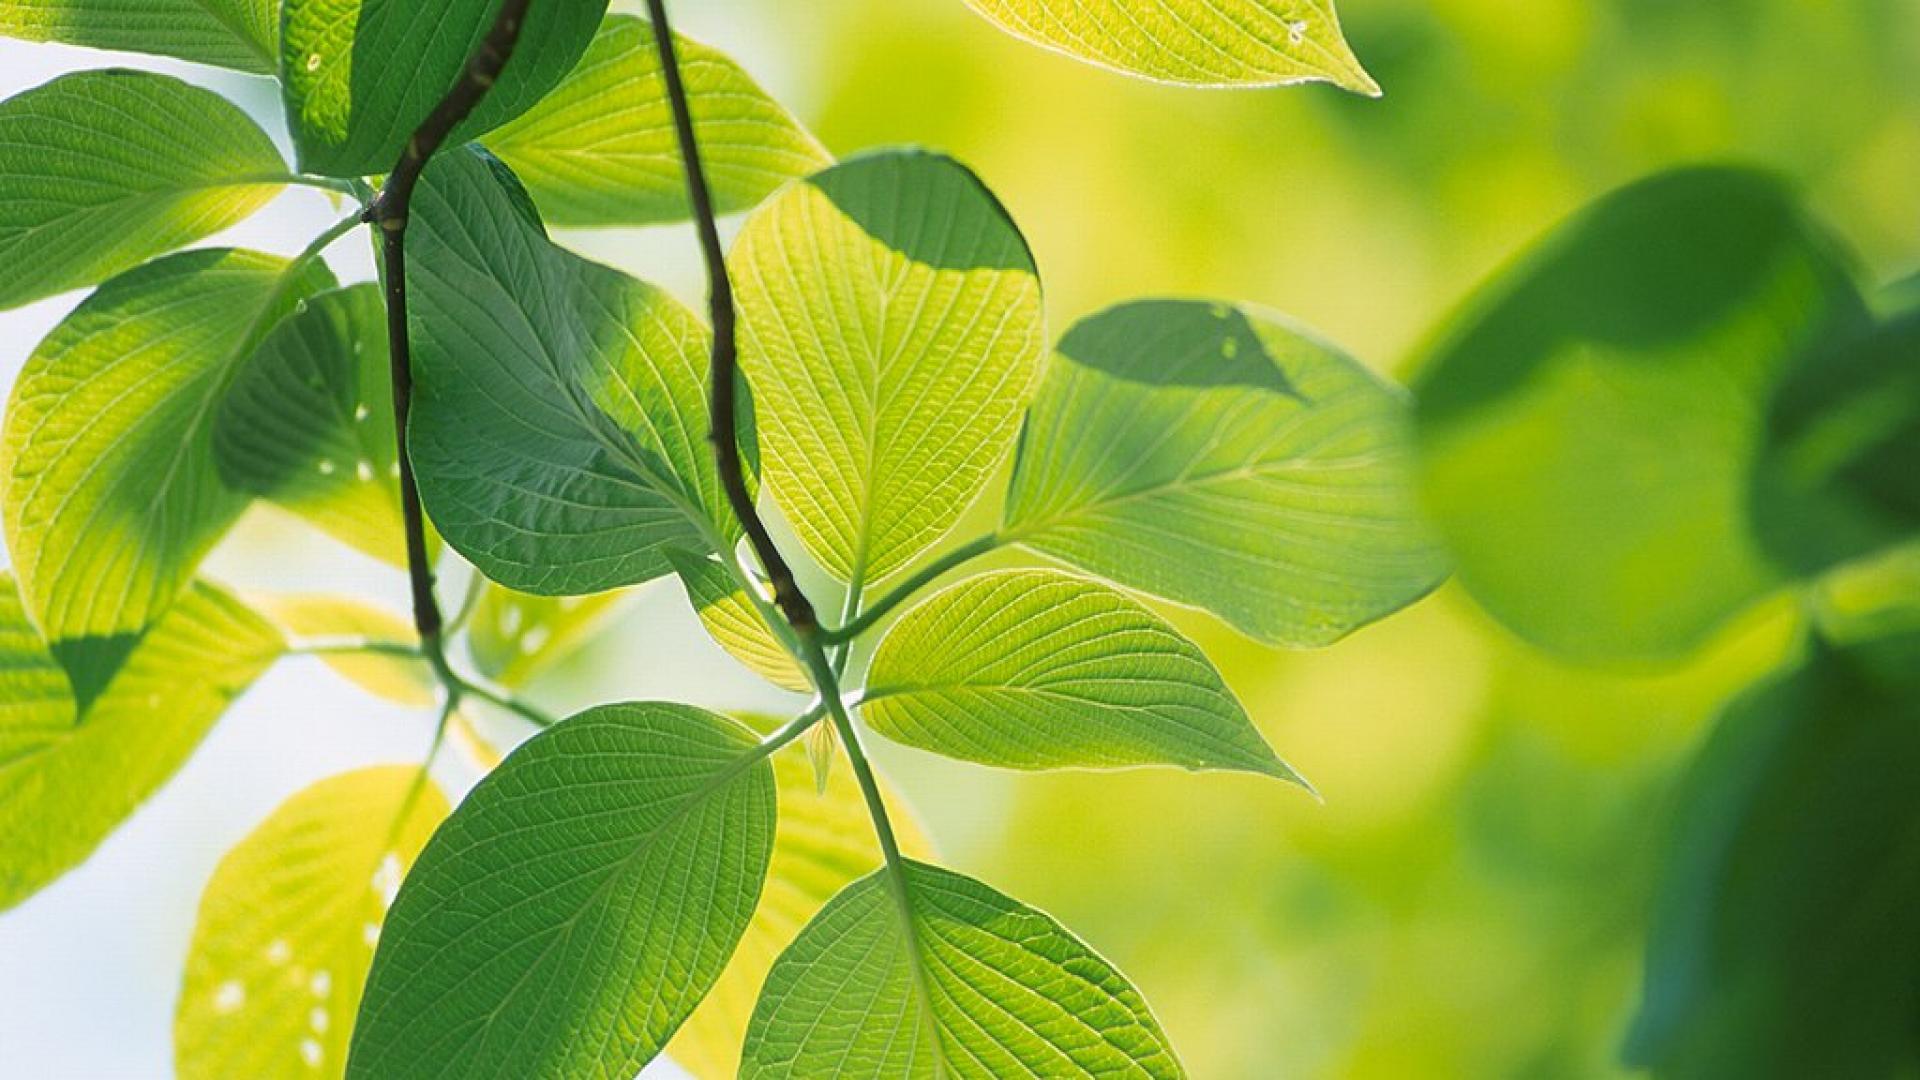 Green Leaf Wallpaper HD - WallpaperSafari